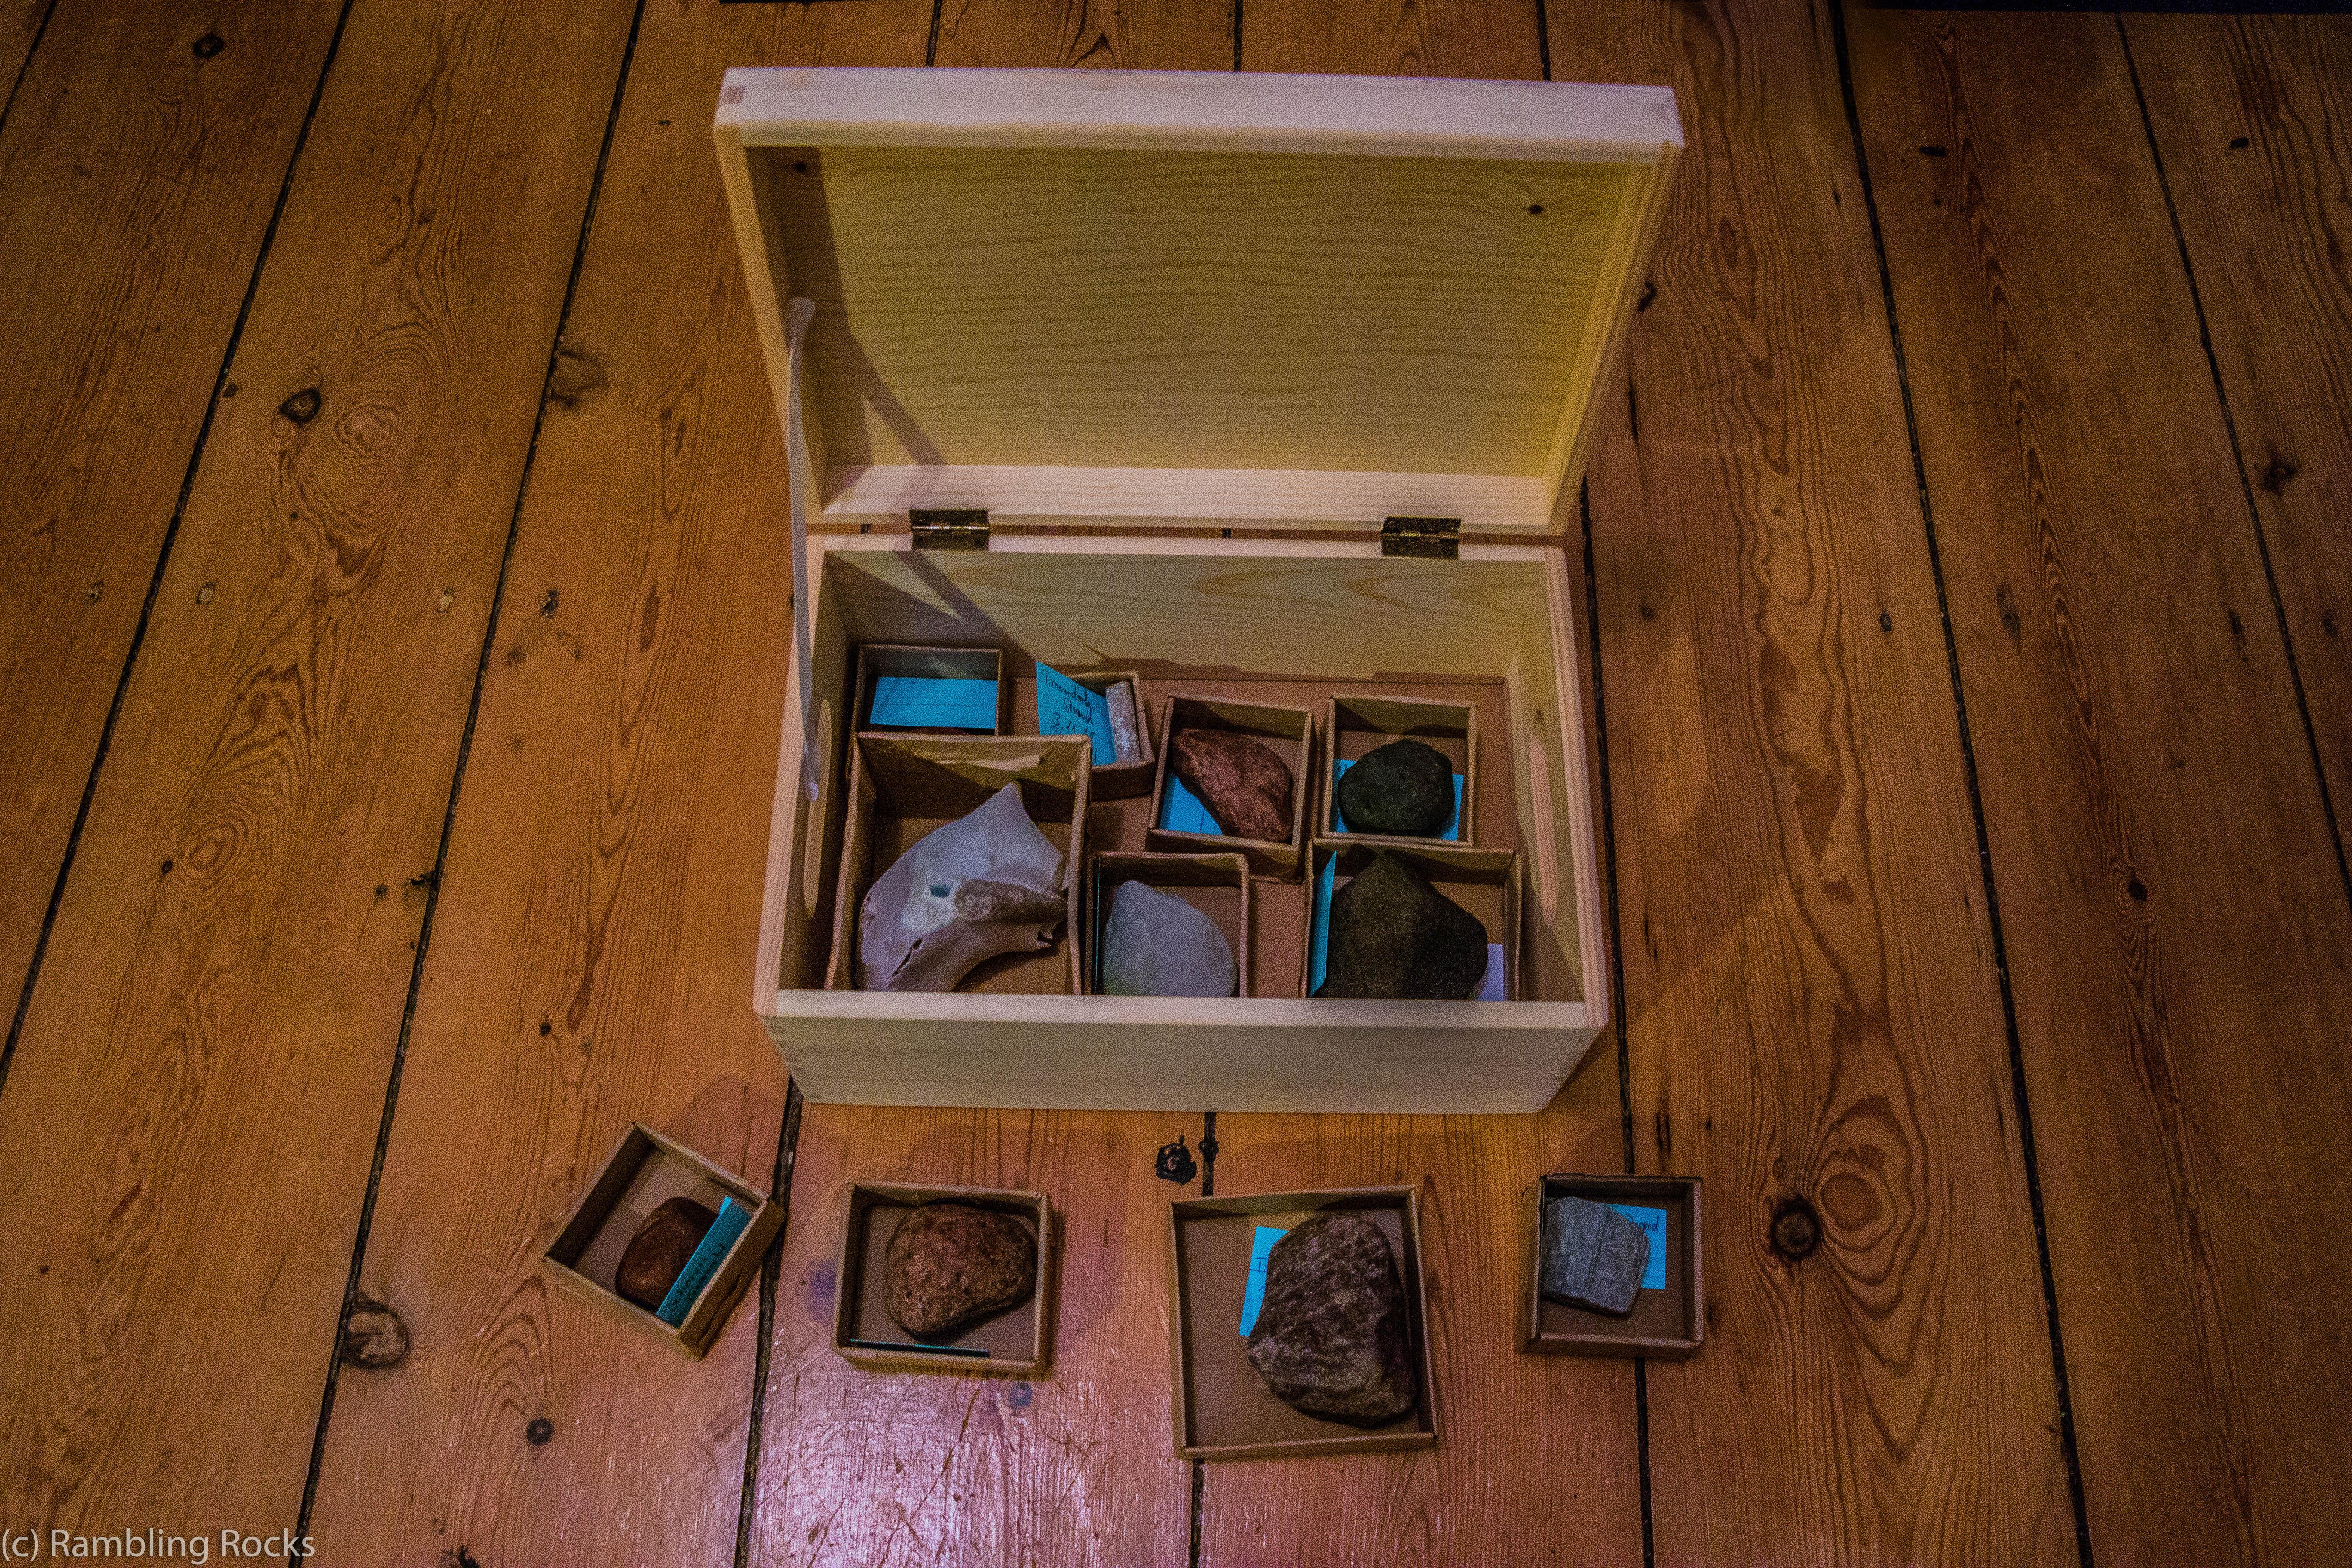 Minimalist Sammlung